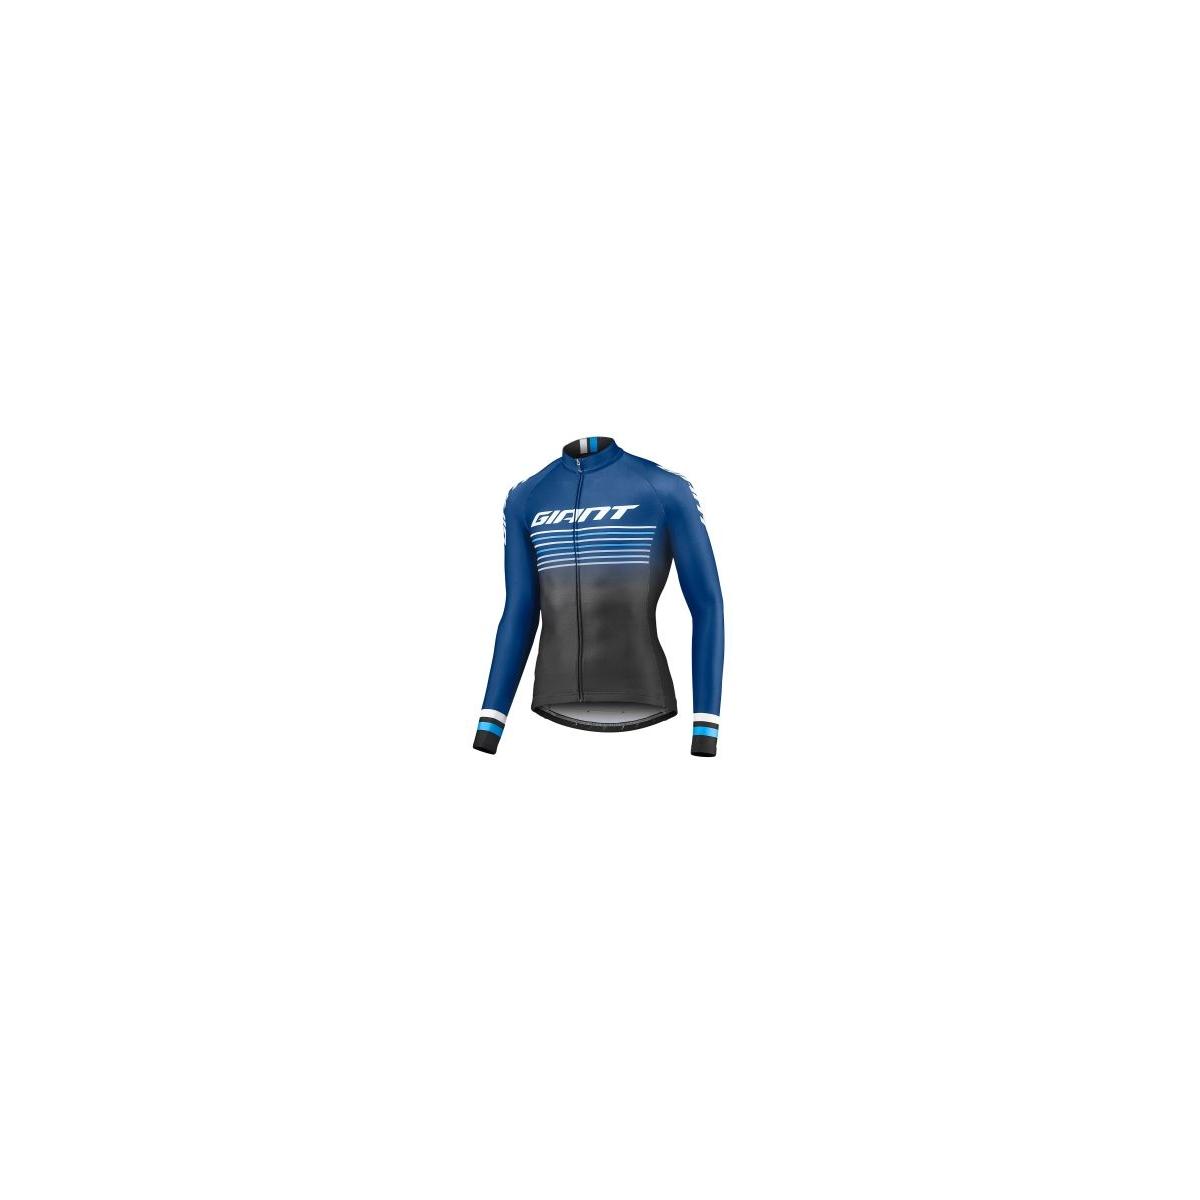 Giant Race Day Long Sleeve Jersey dd183d730